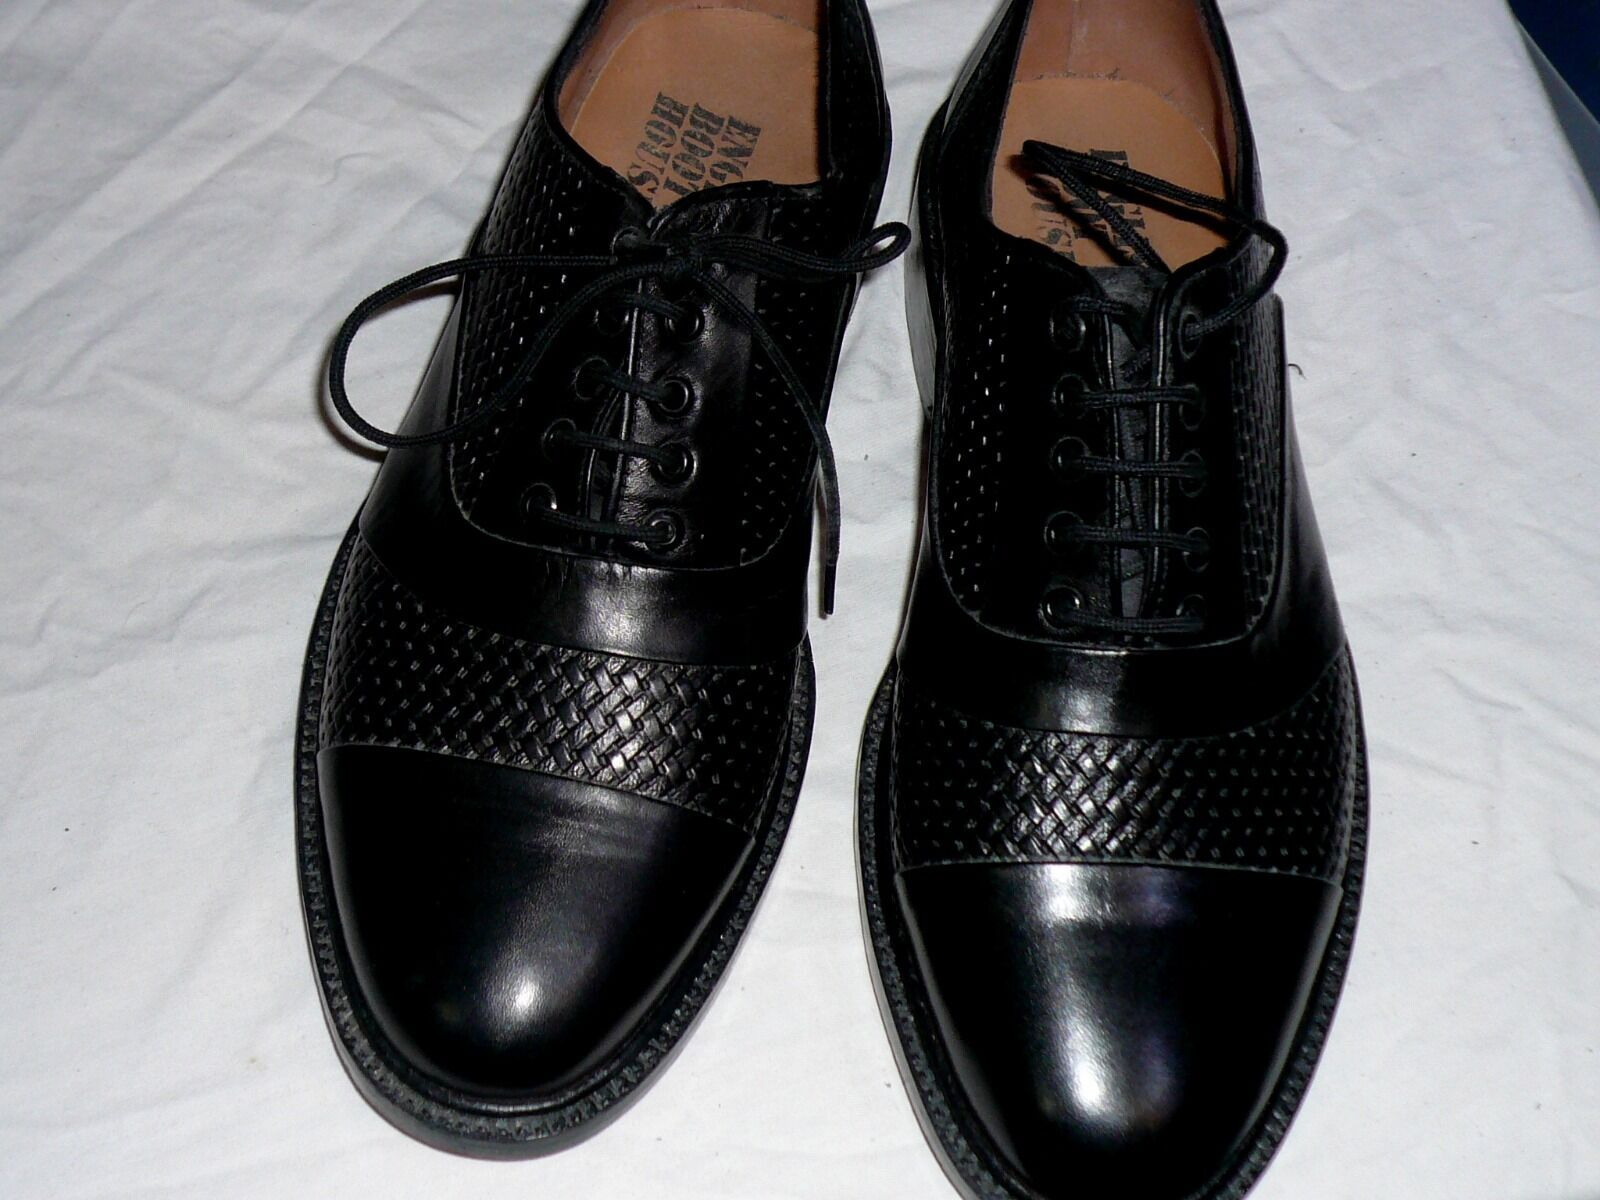 Men's Formal,  Business, Groom  Oxfords Leather shoes  149.00